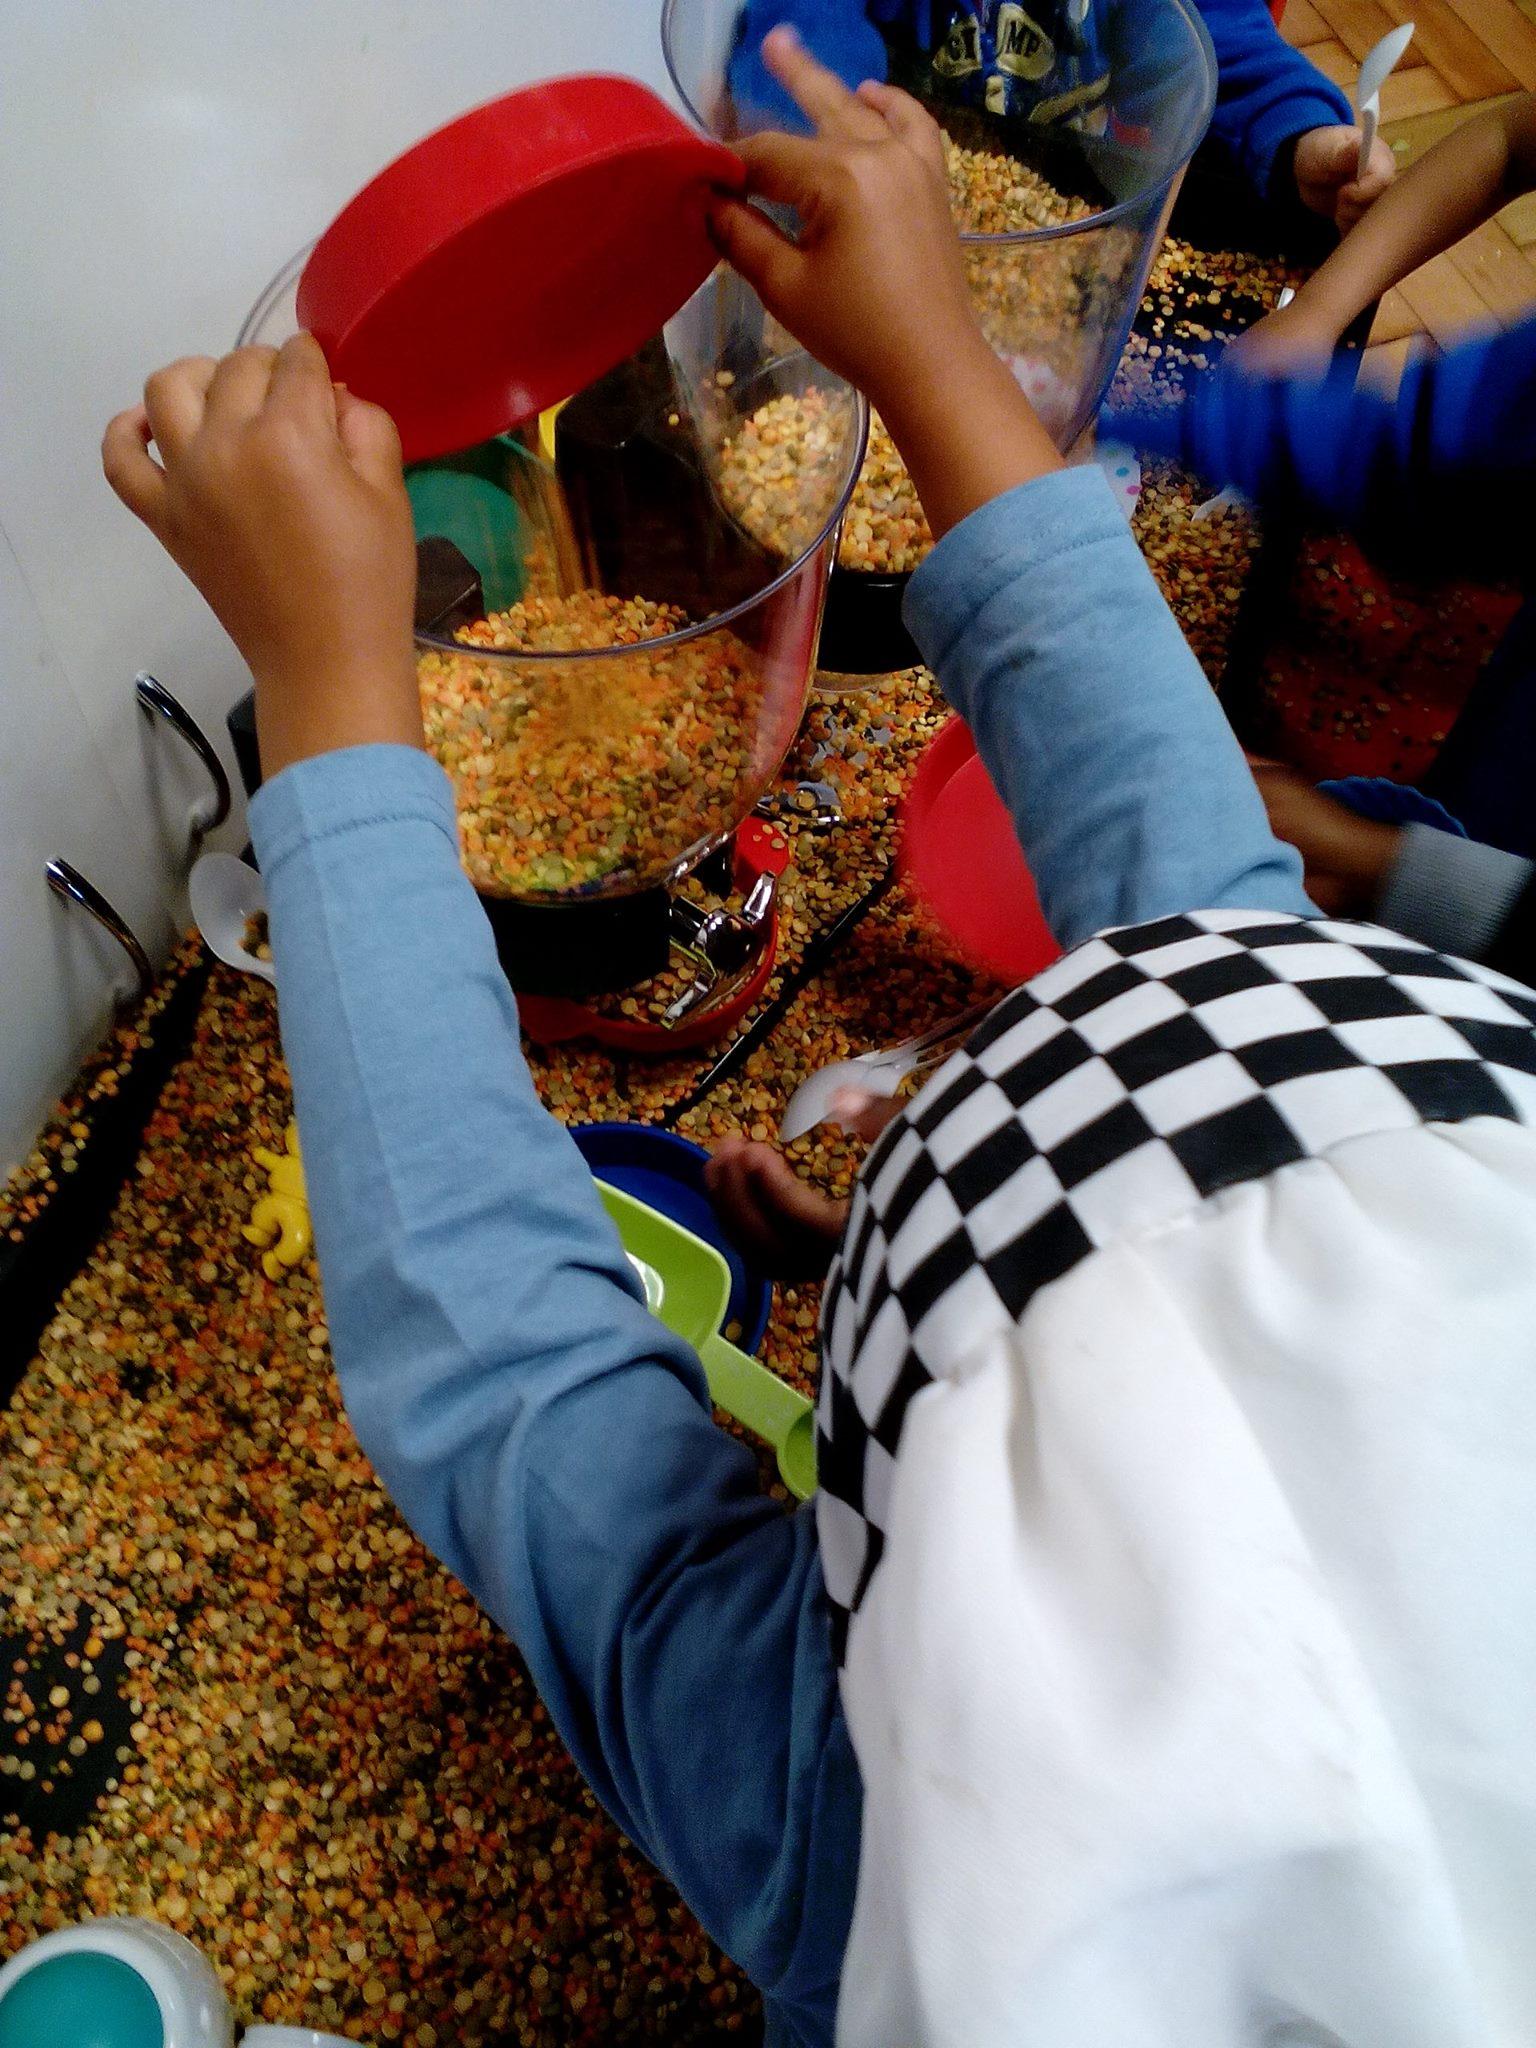 Children doing activity at Millies